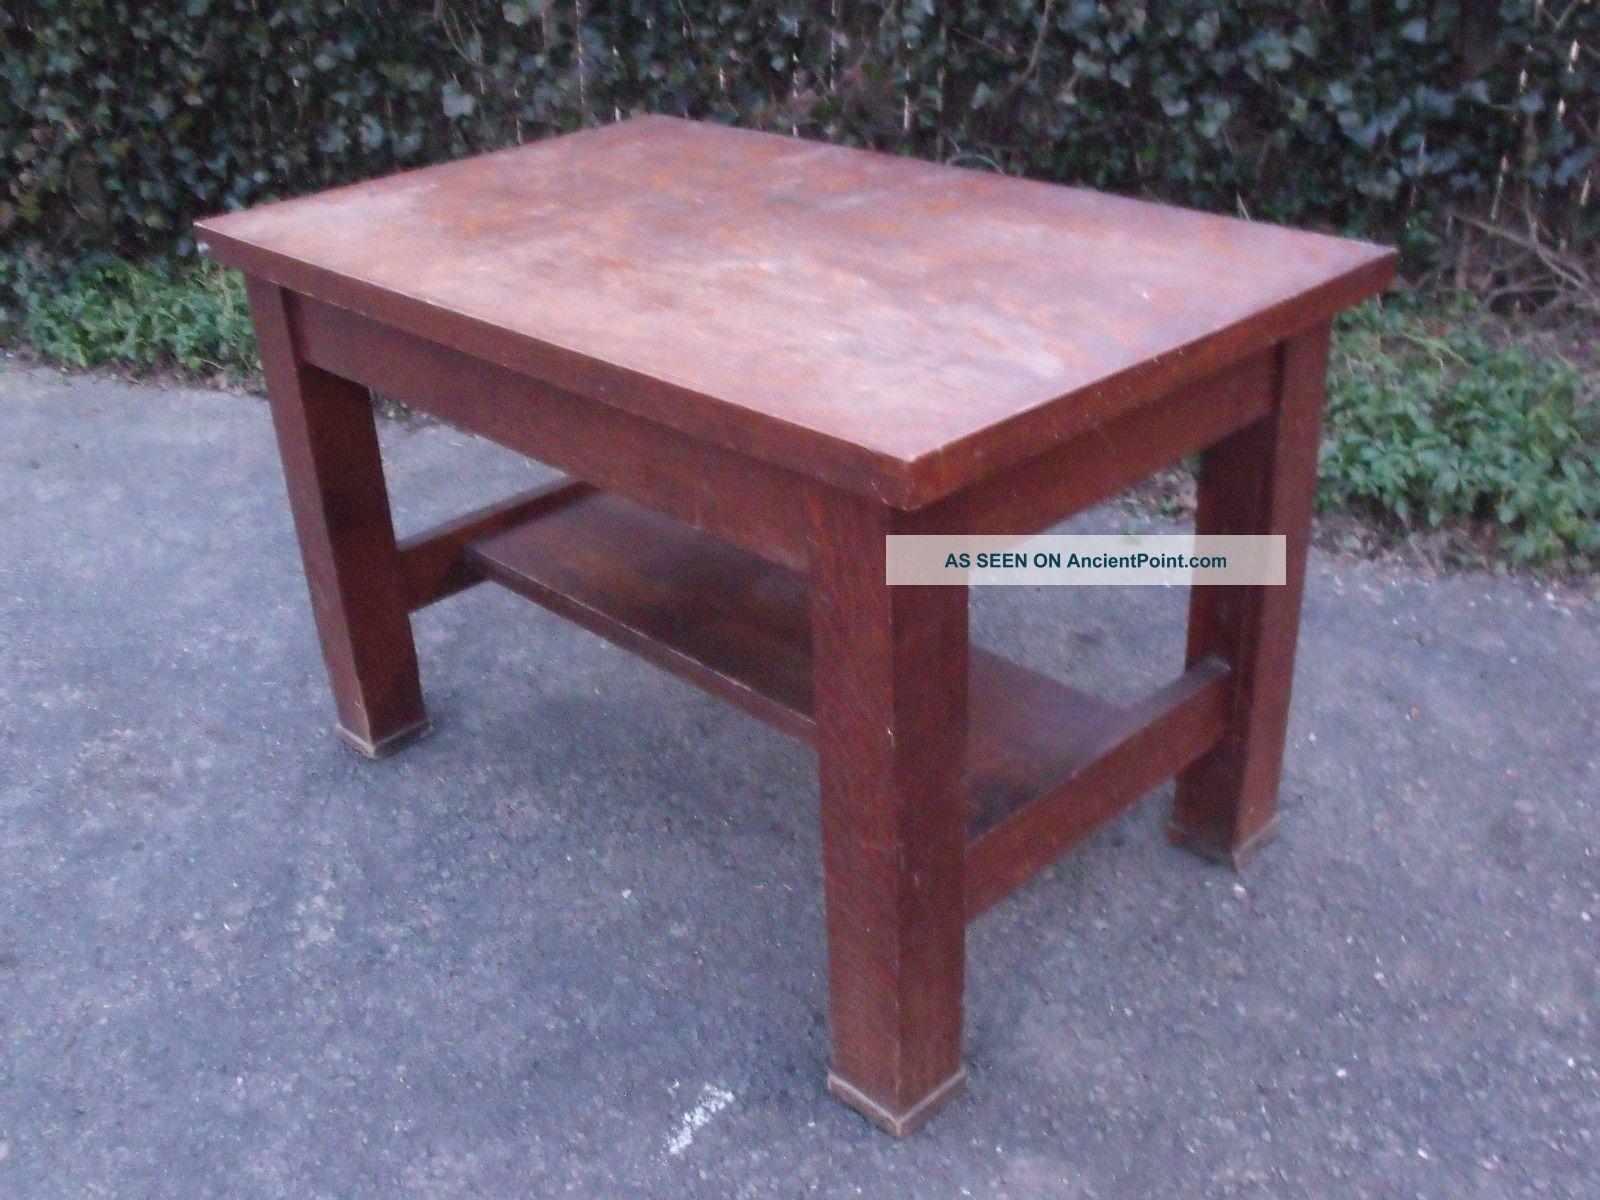 Antique Quartersawn Craftsman / Mission Style Oak Writing Desk 1900-1950 photo